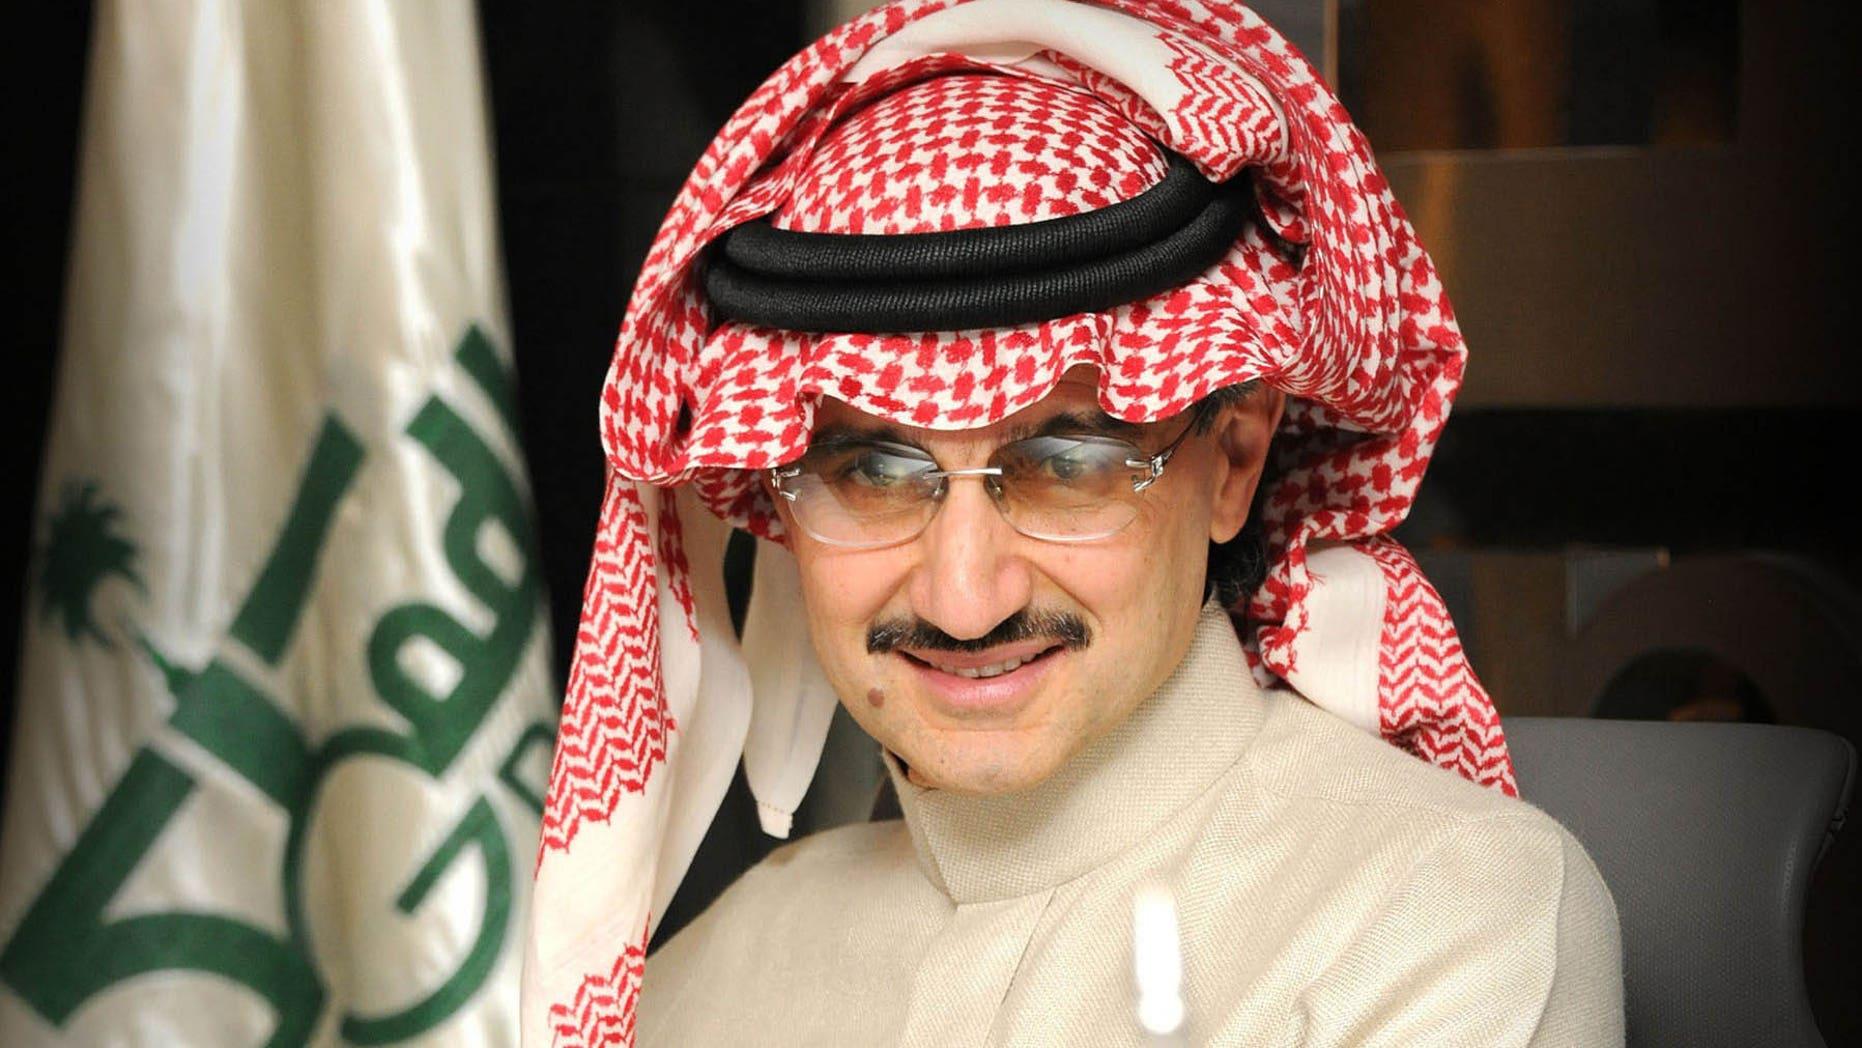 HRH Prince Alwaleed Bin Talal, Chairman Kingdom Holding Company.